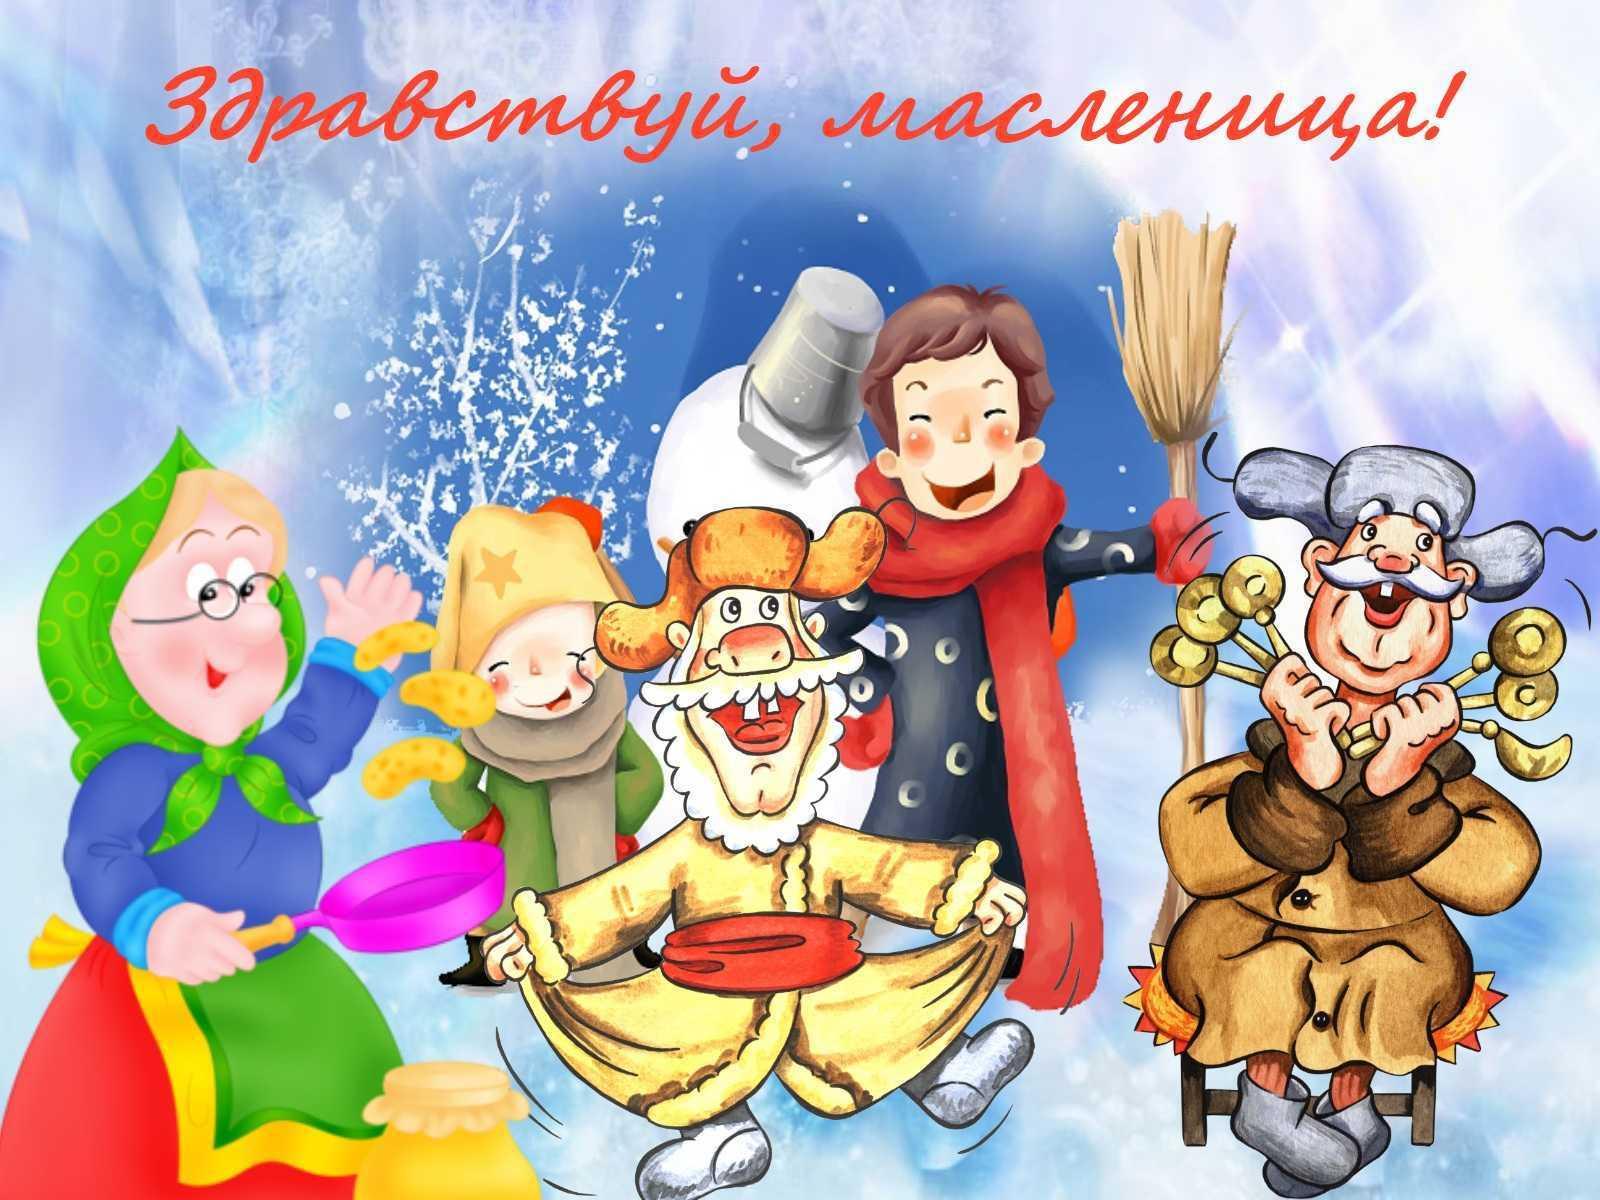 https://lifeo.ru/wp-content/uploads/maslenica-2.jpg